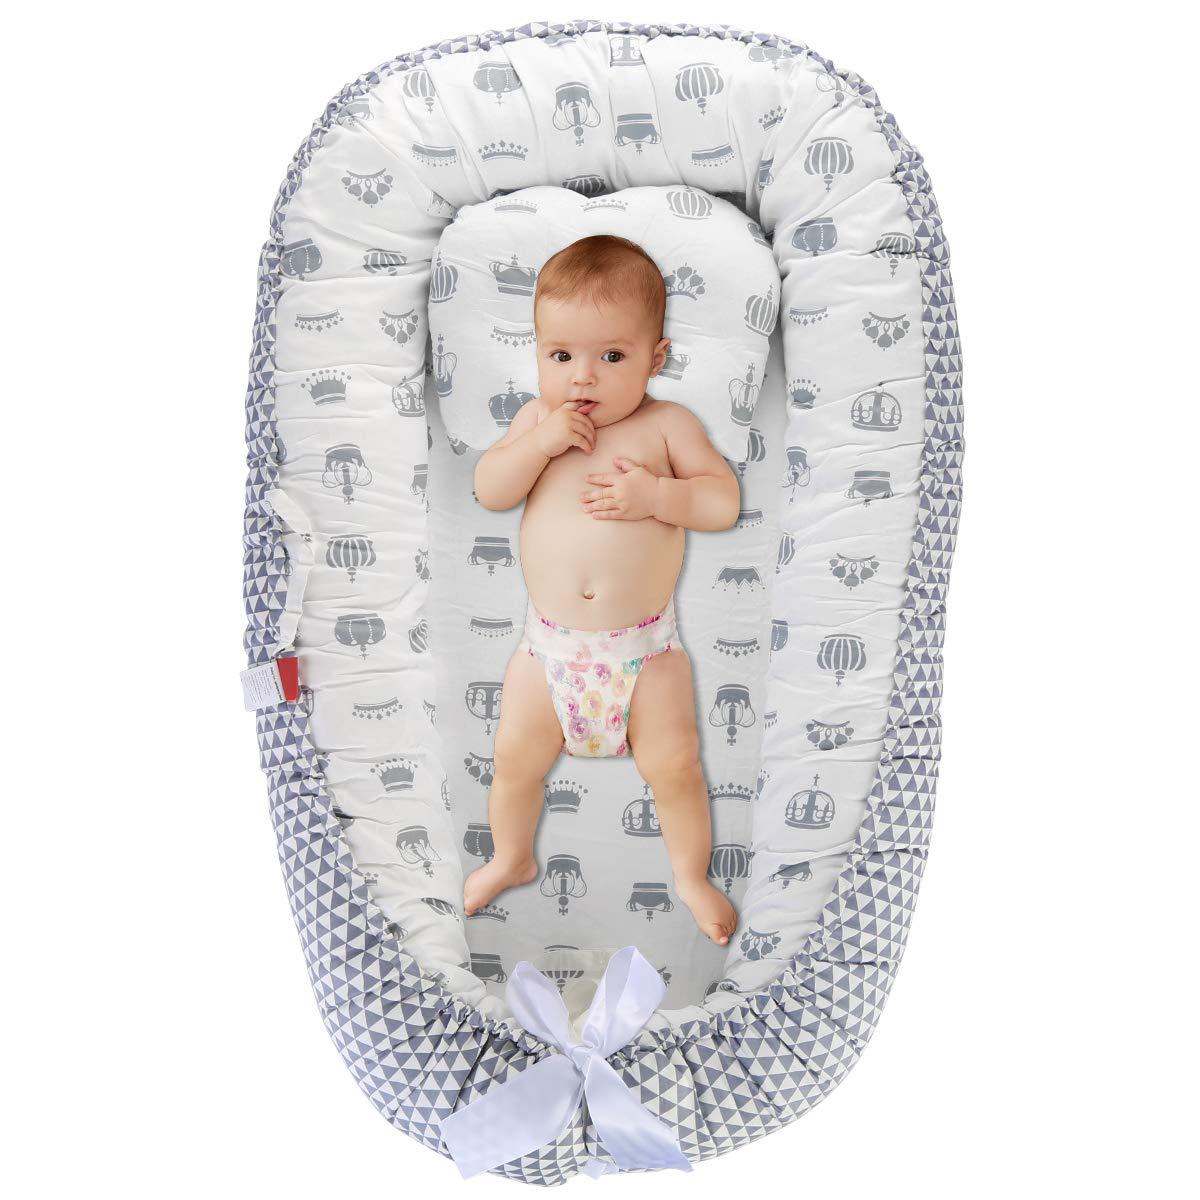 Oenbopo Baby: Best Co-Sleeping Bassinets